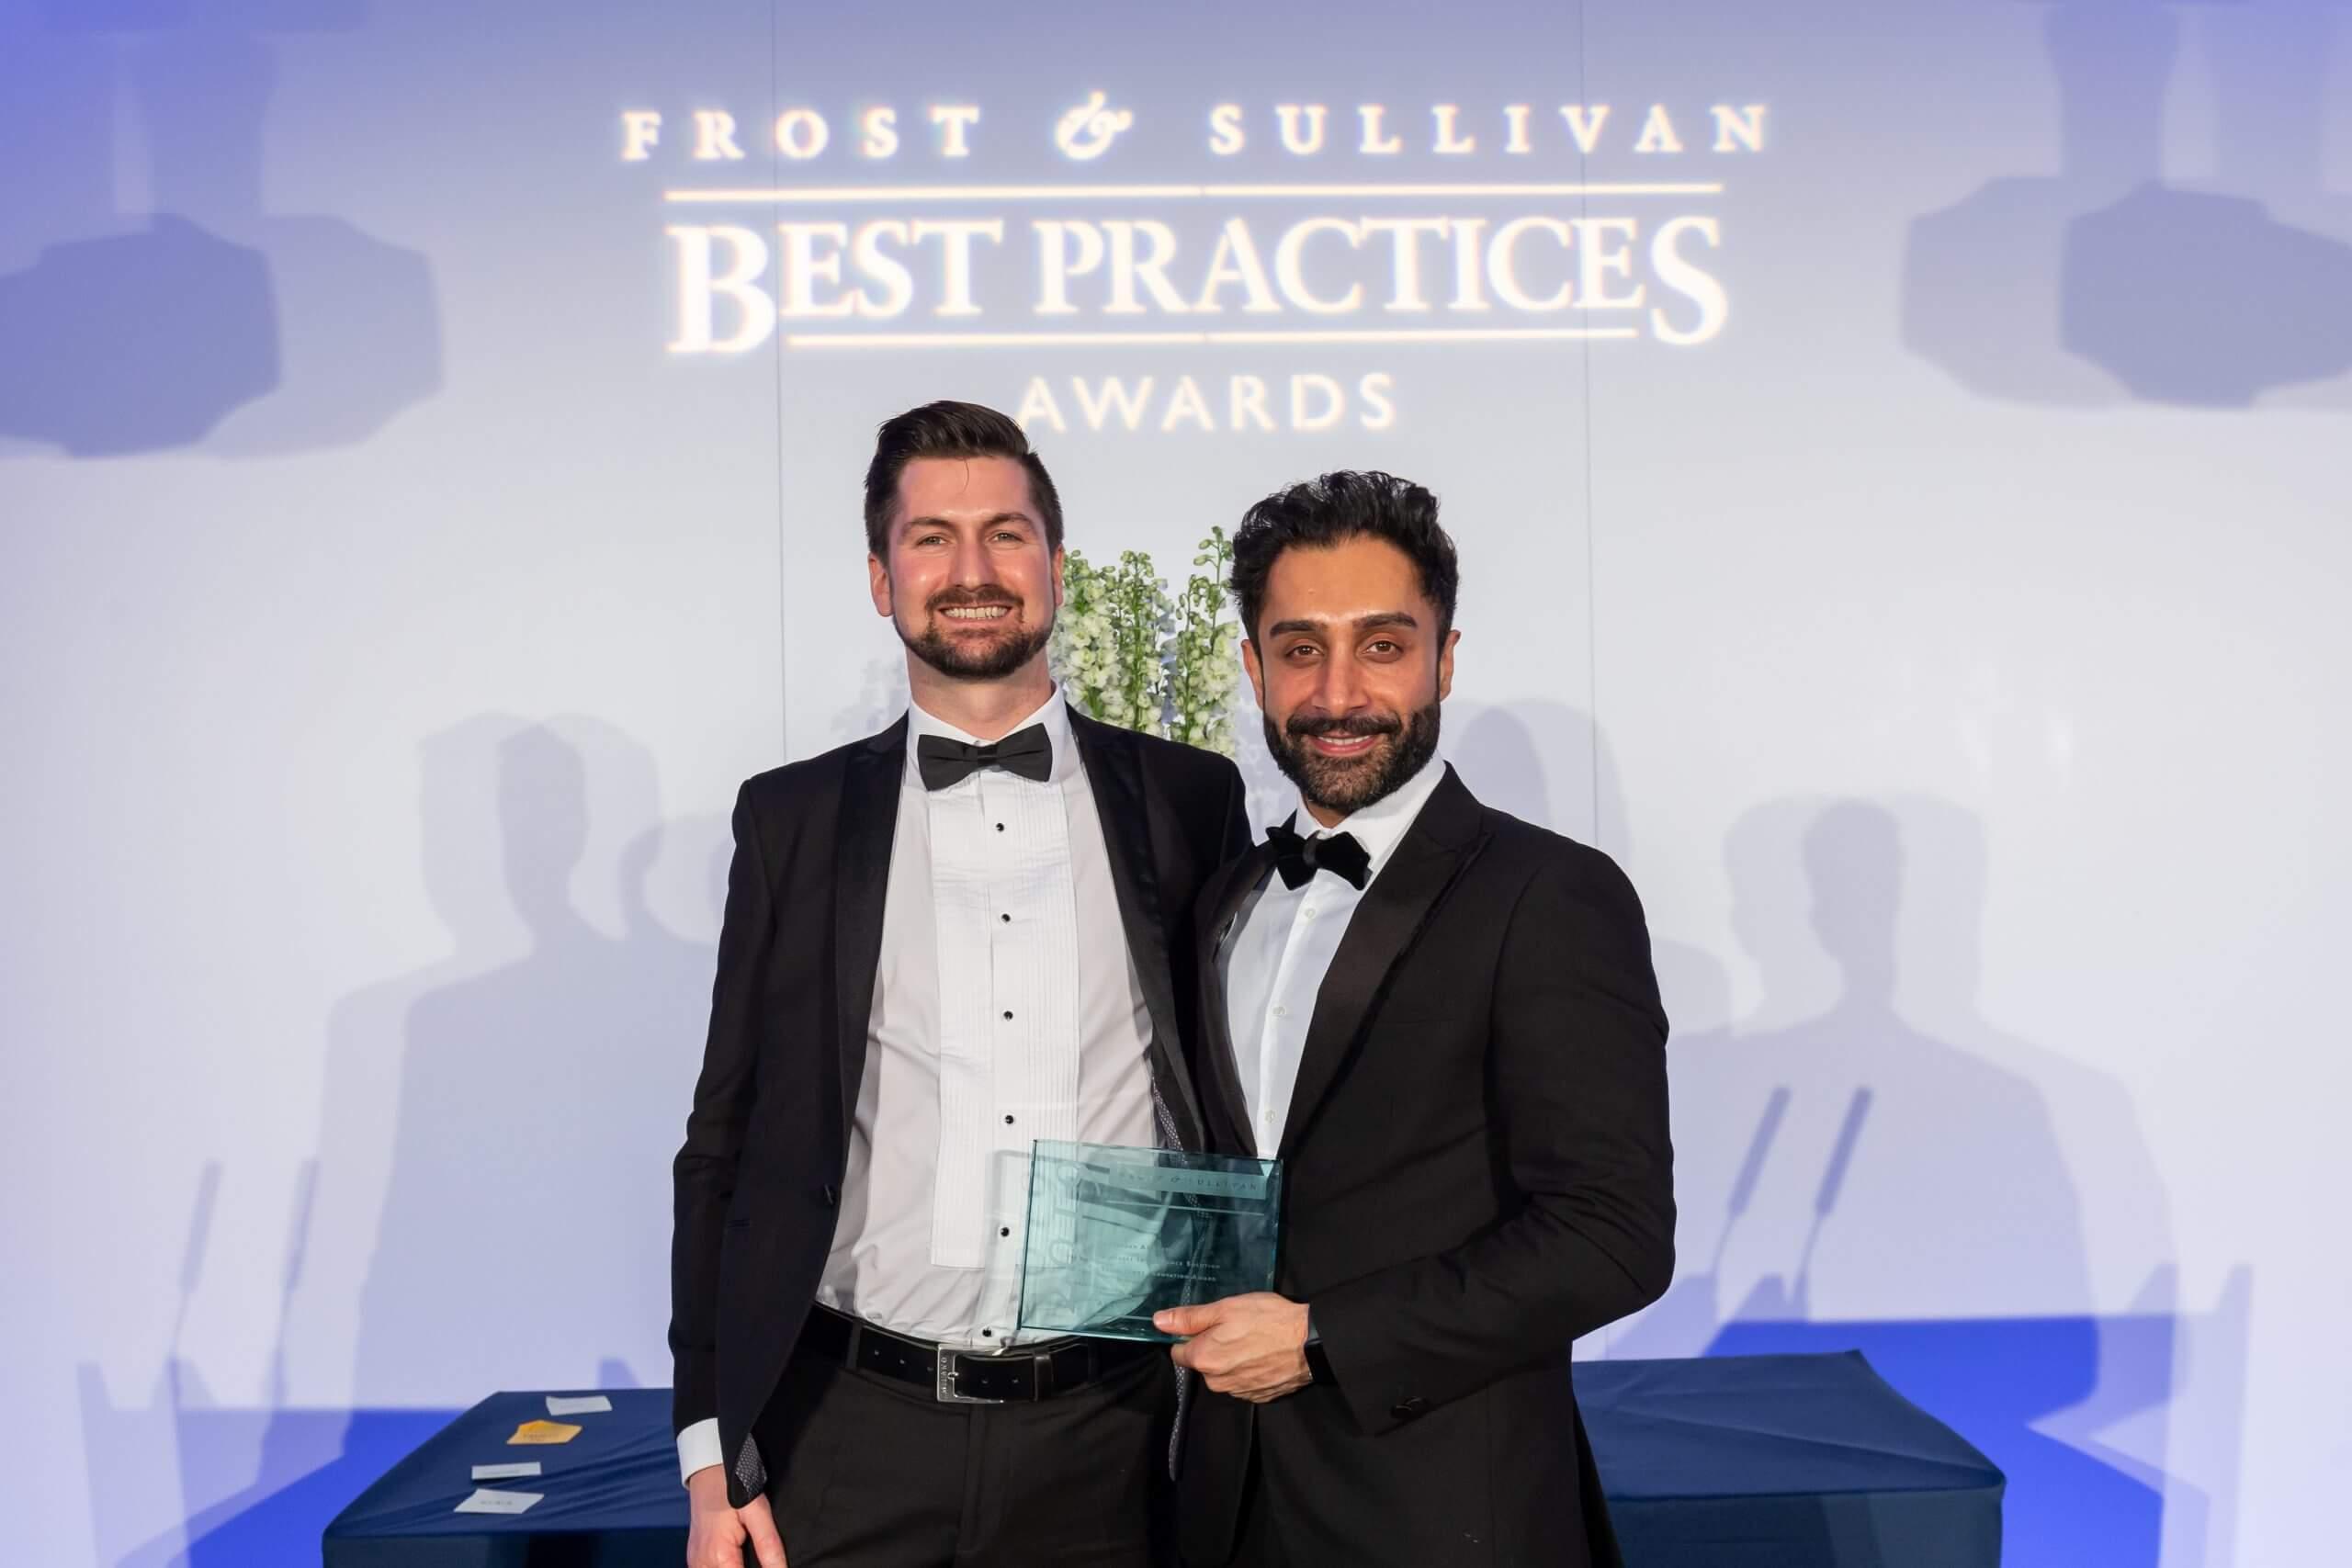 Best Practices Awards London